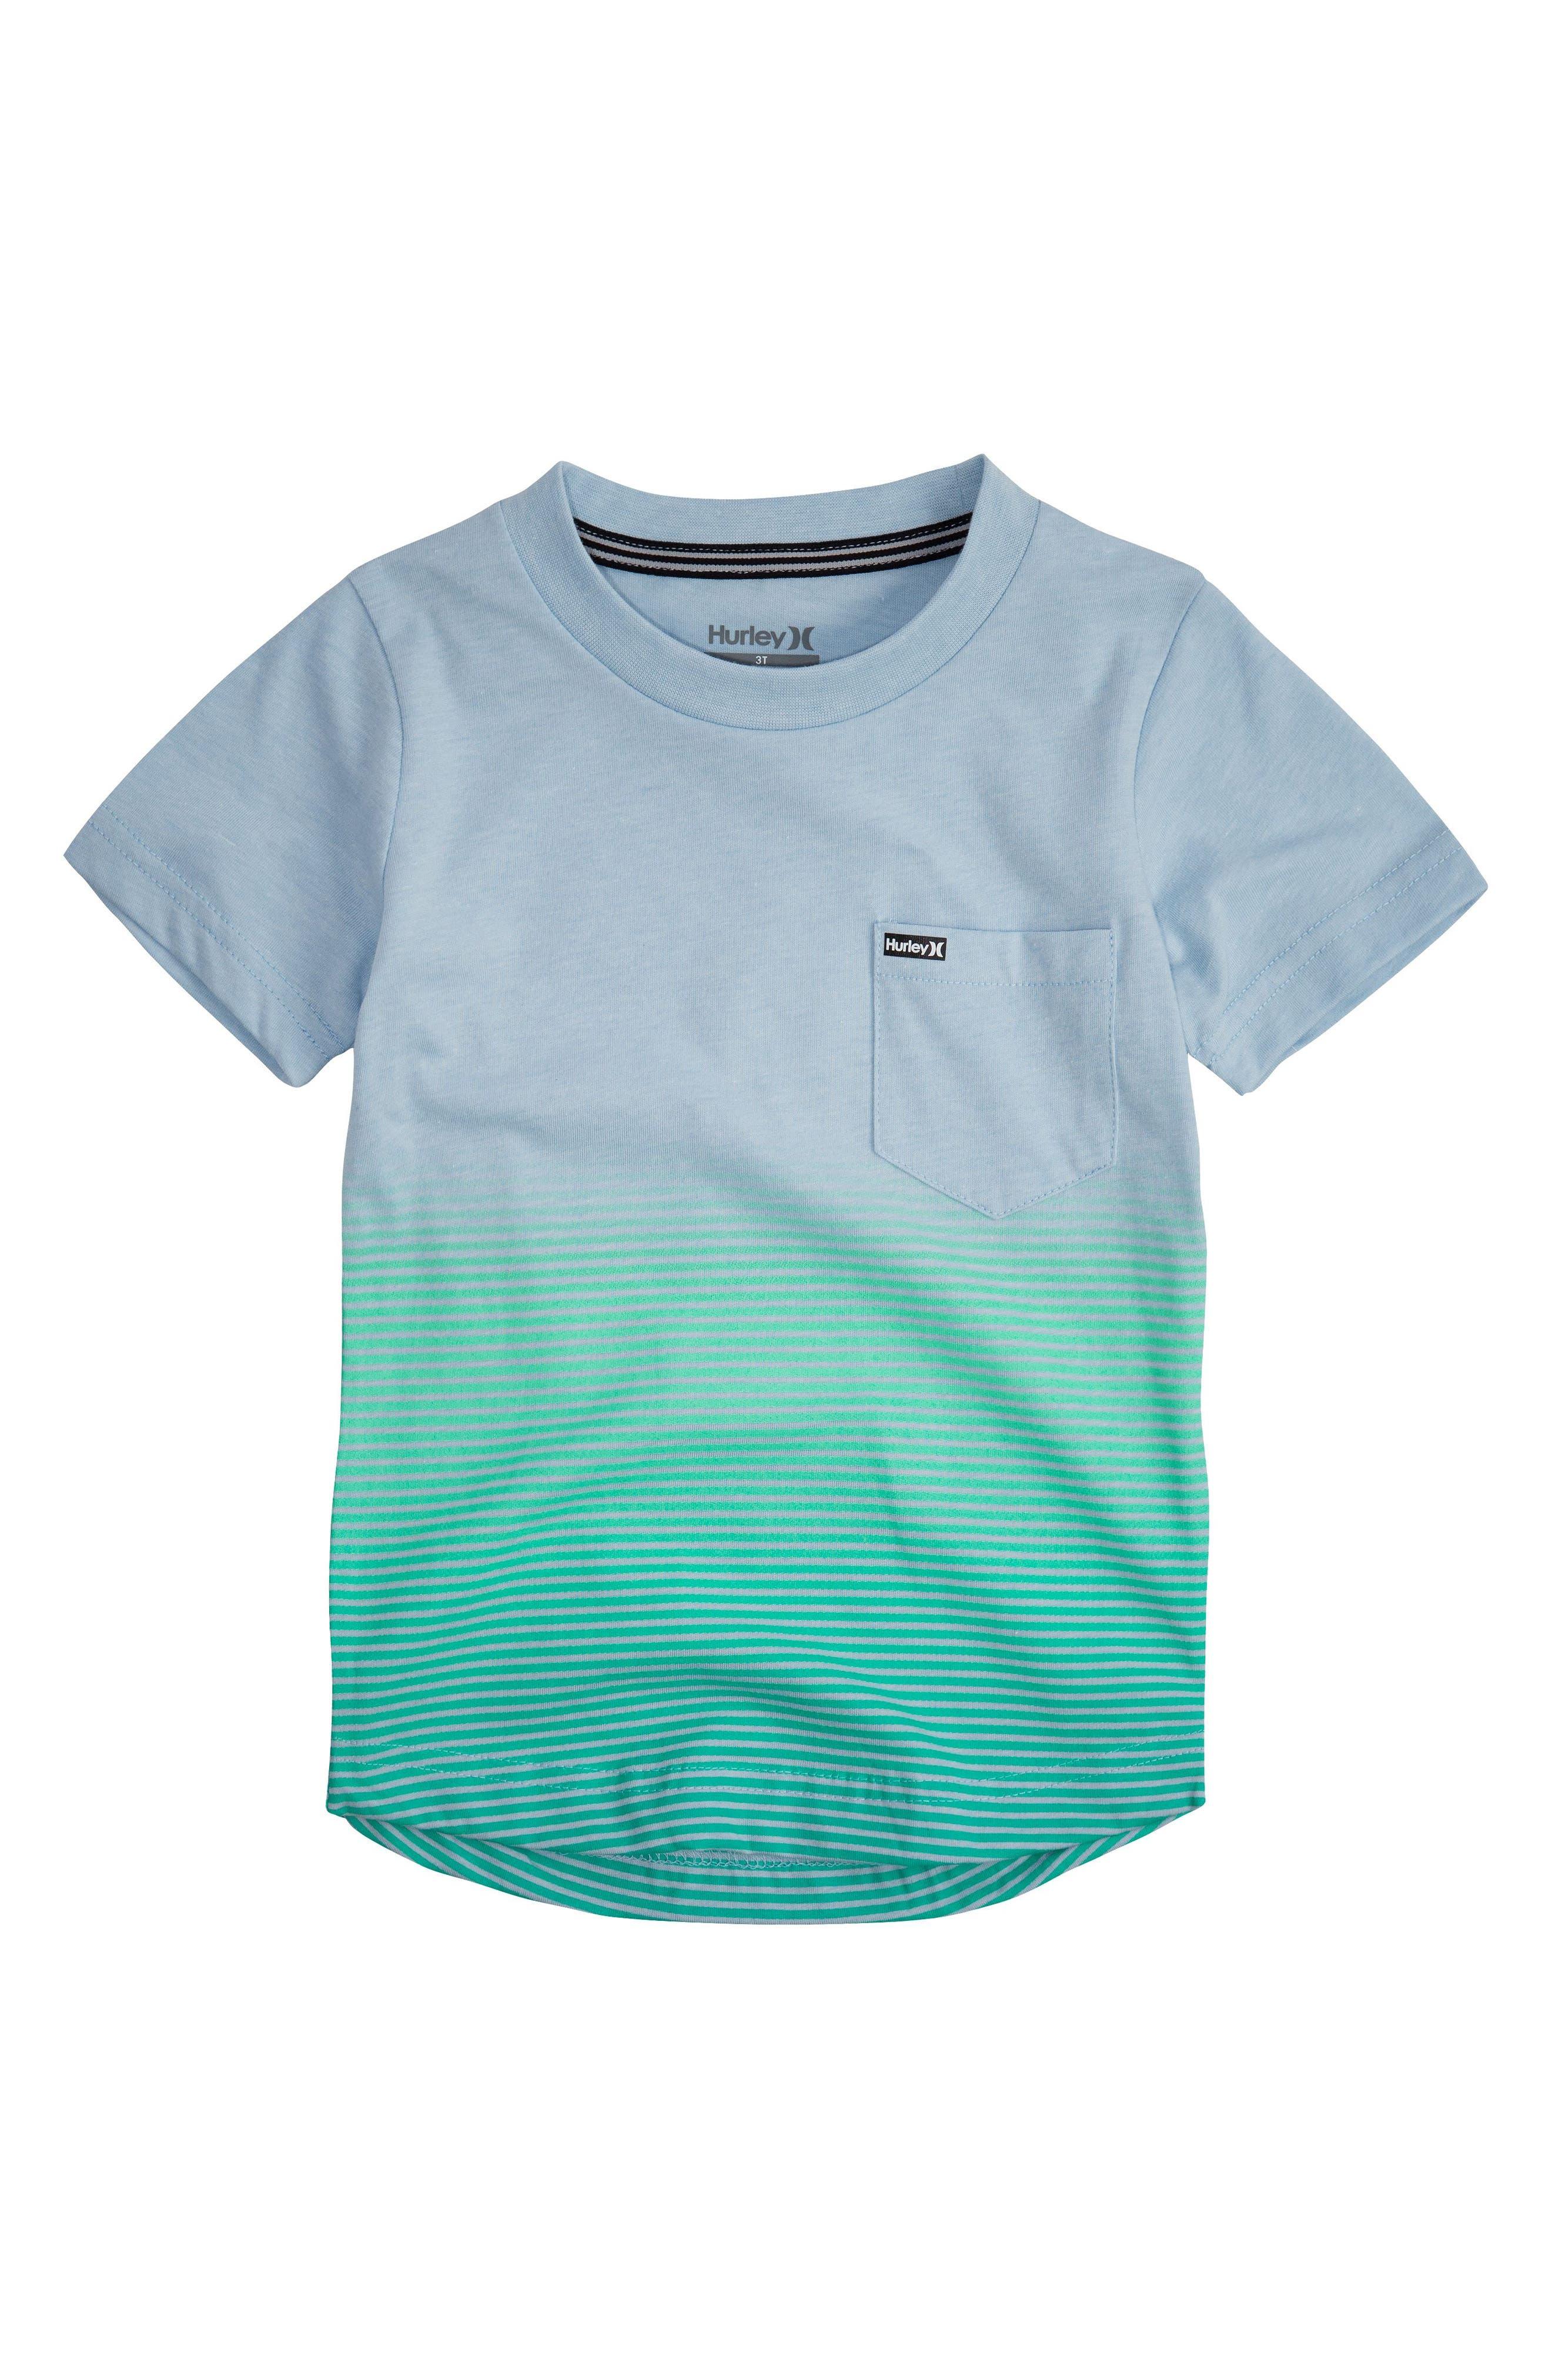 Hurley Ombré Stripe T Shirt Toddler Boys & Little Boys